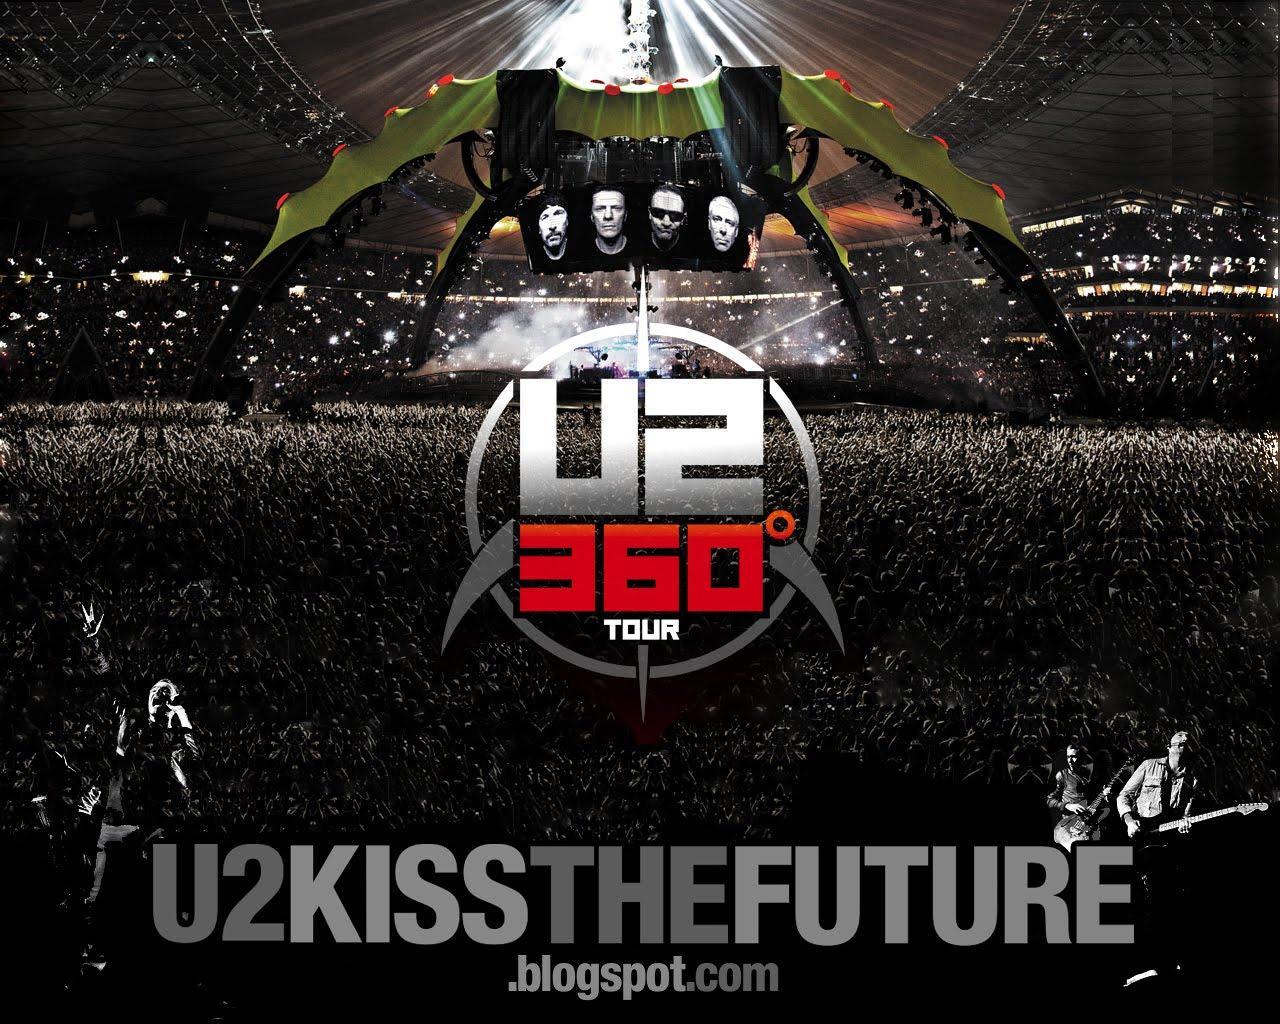 u2 kiss the future - photo #5